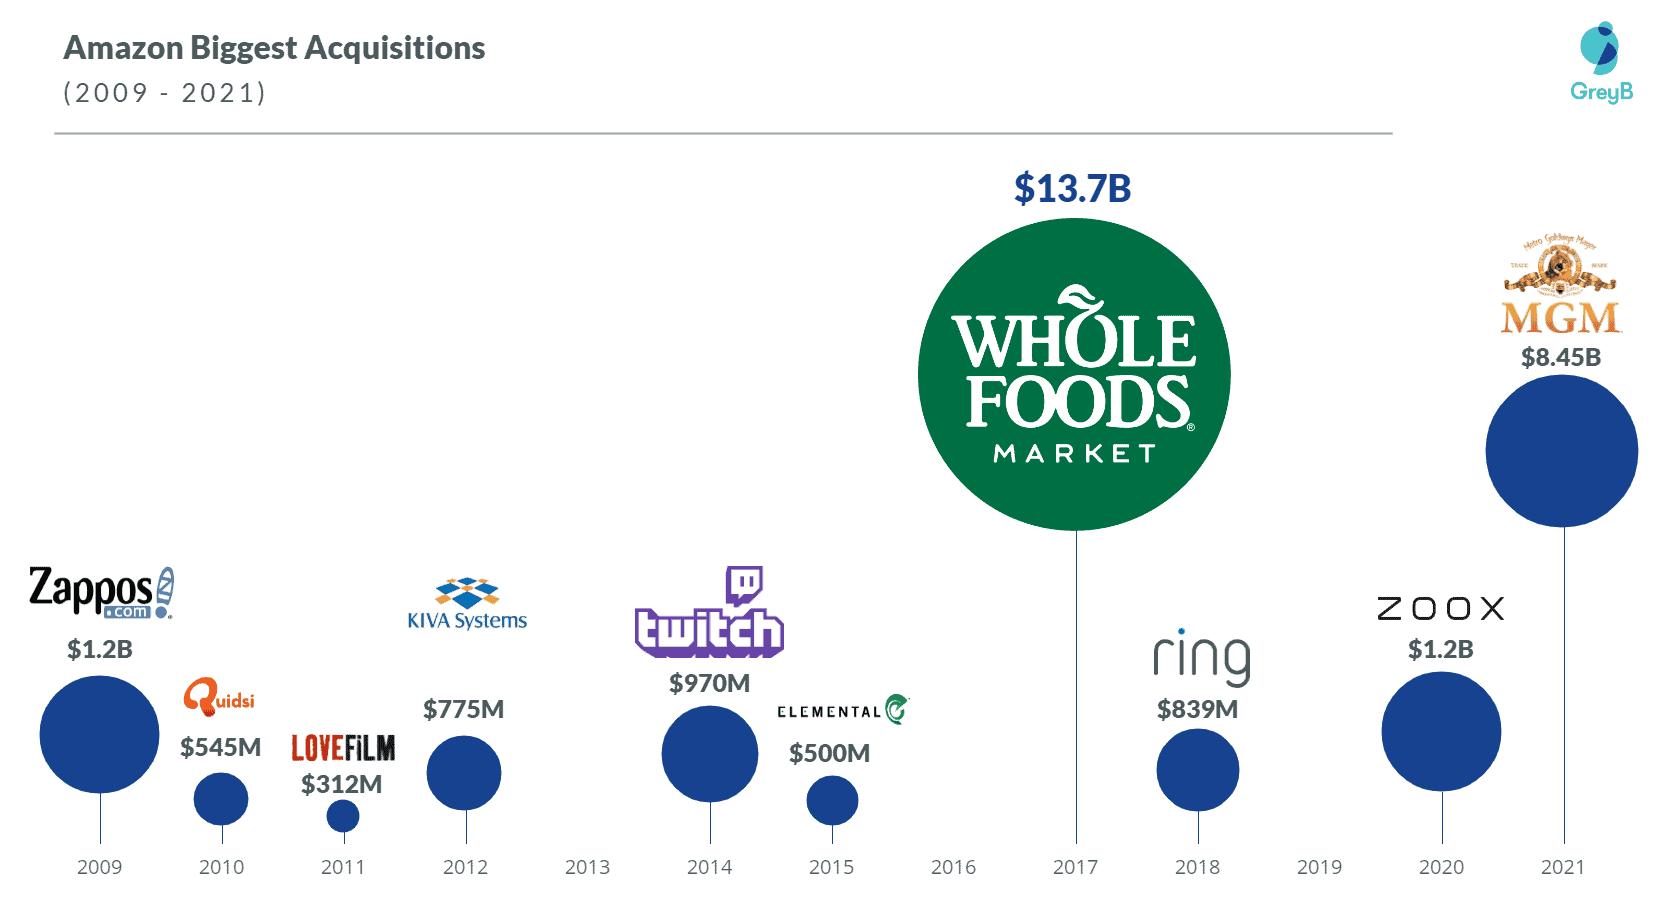 Amazon biggest acquisitions 2021